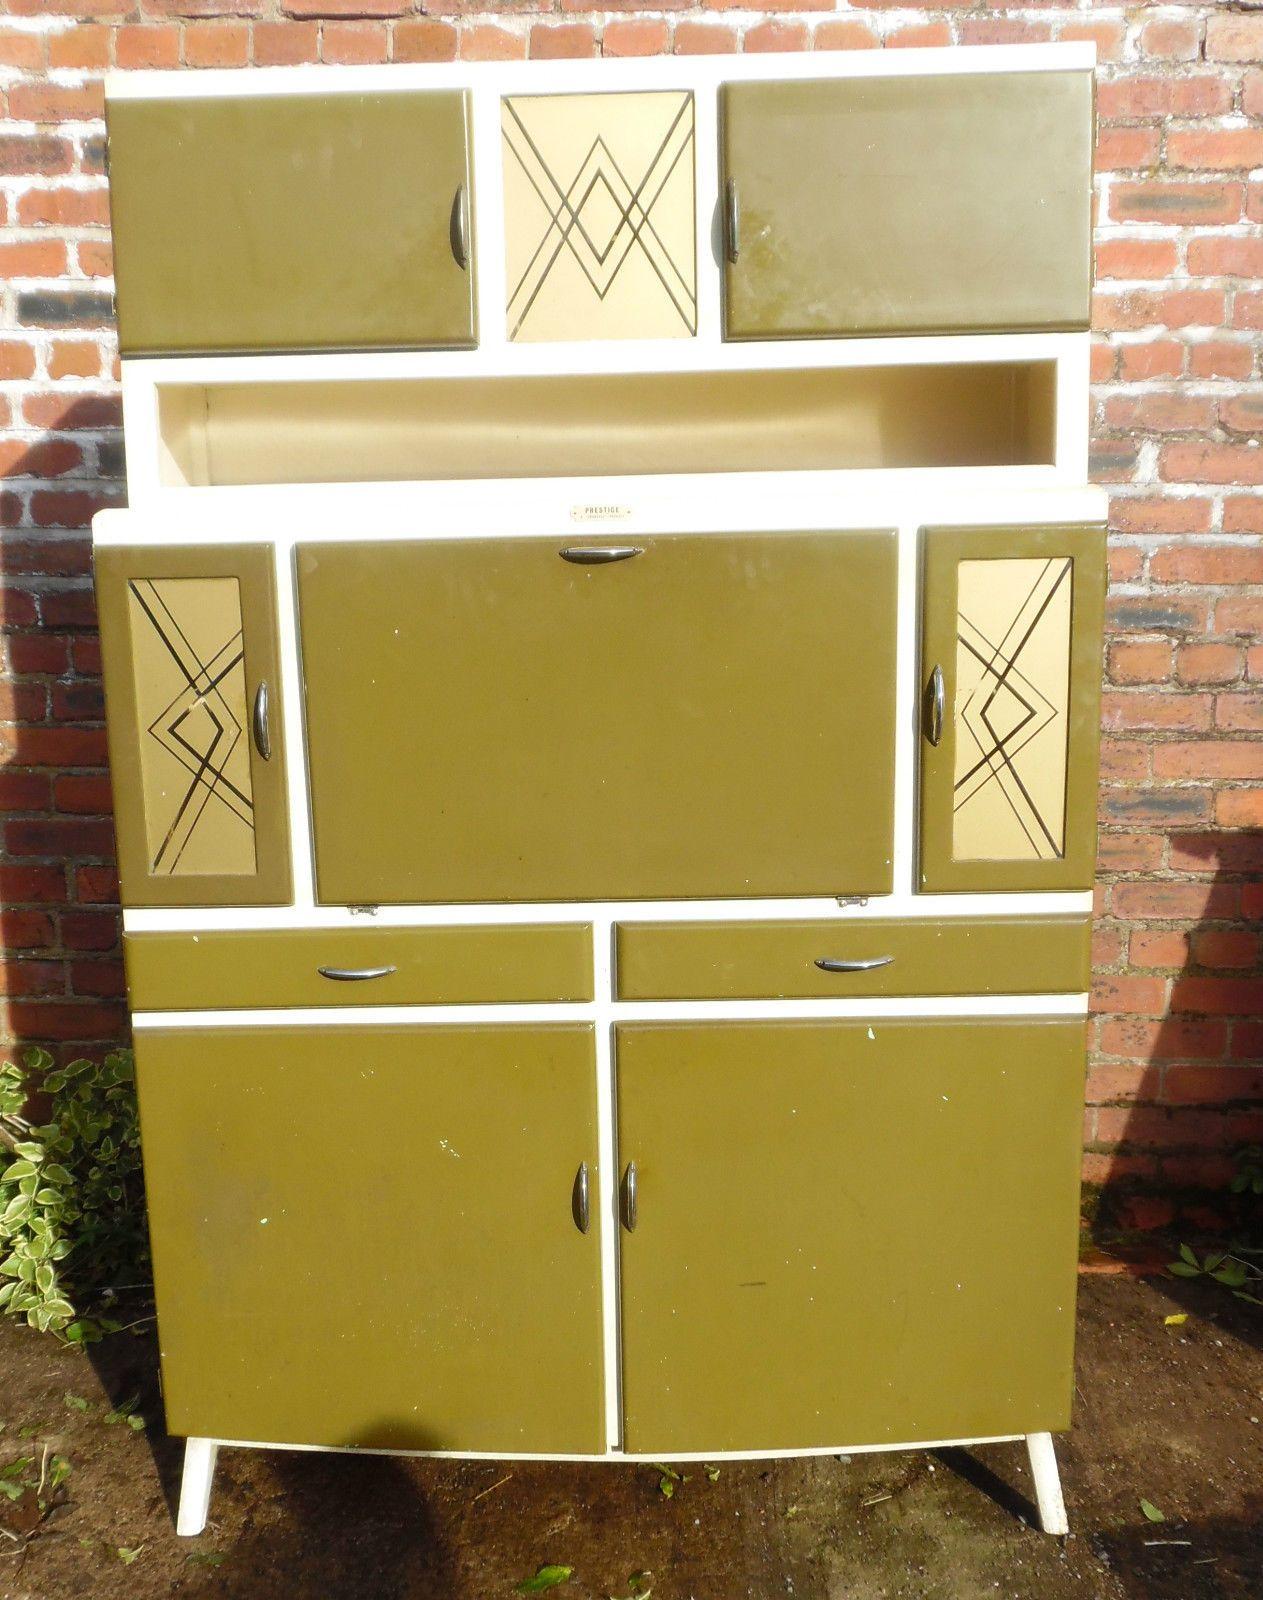 Vintage Prestige Kitchenette Larder Pantry Safe Kitchen Cabinet 50s 60s Retro Cabinet Kitchen Safe Cabinet